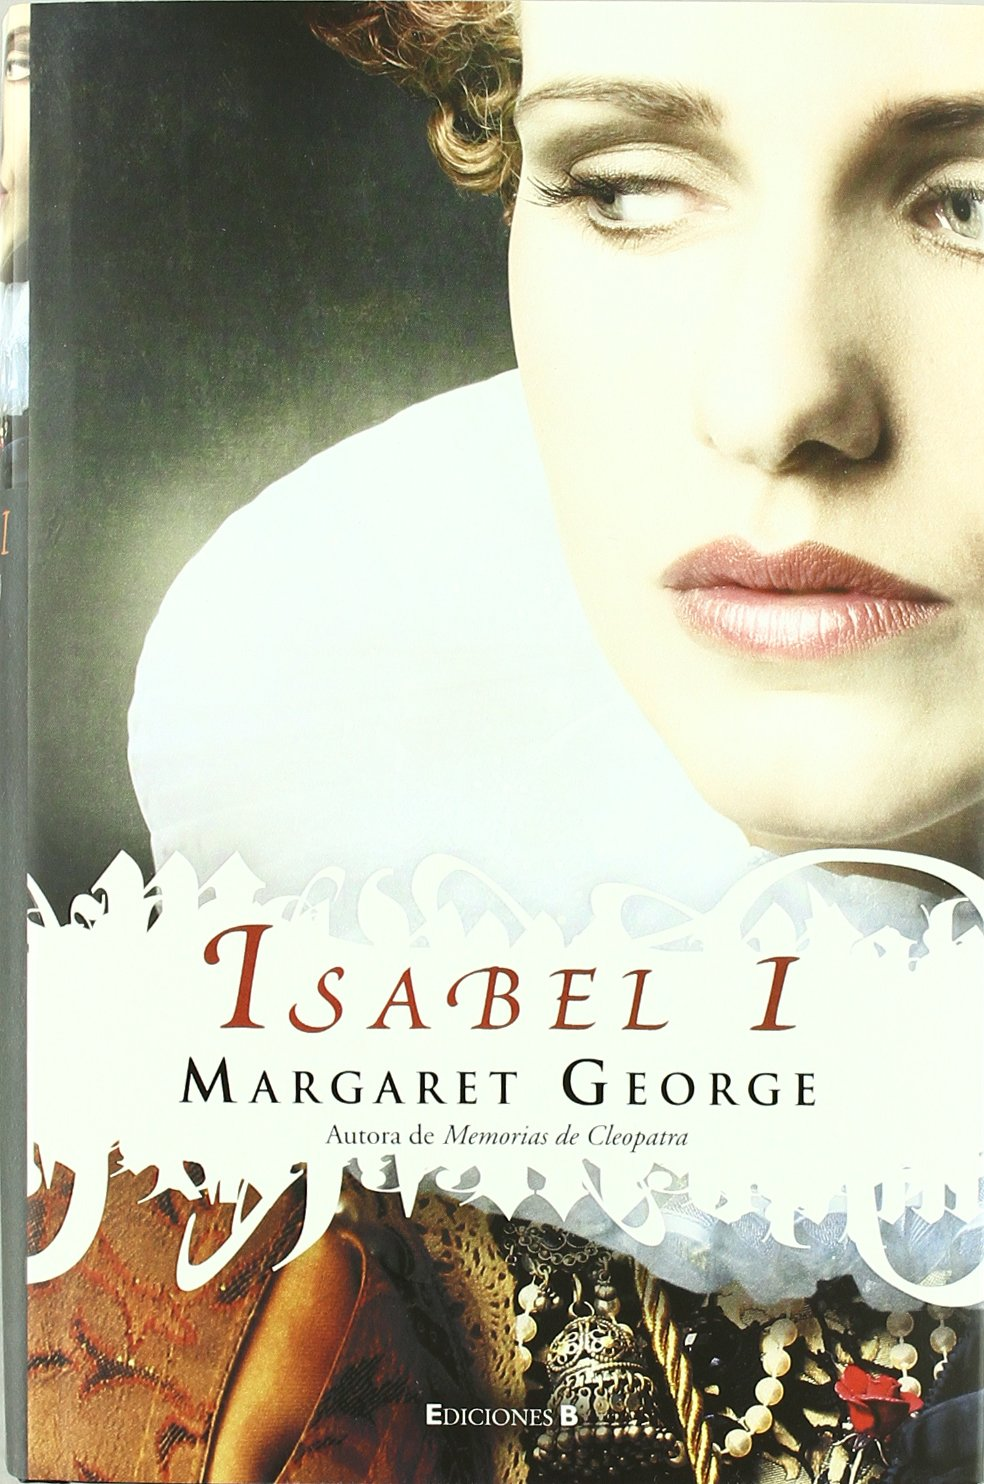 Isabel I (HISTÓRICA) Tapa dura – 28 oct 2011 Margaret George B (Ediciones B) 8466649719 1558-1603; Fiction.